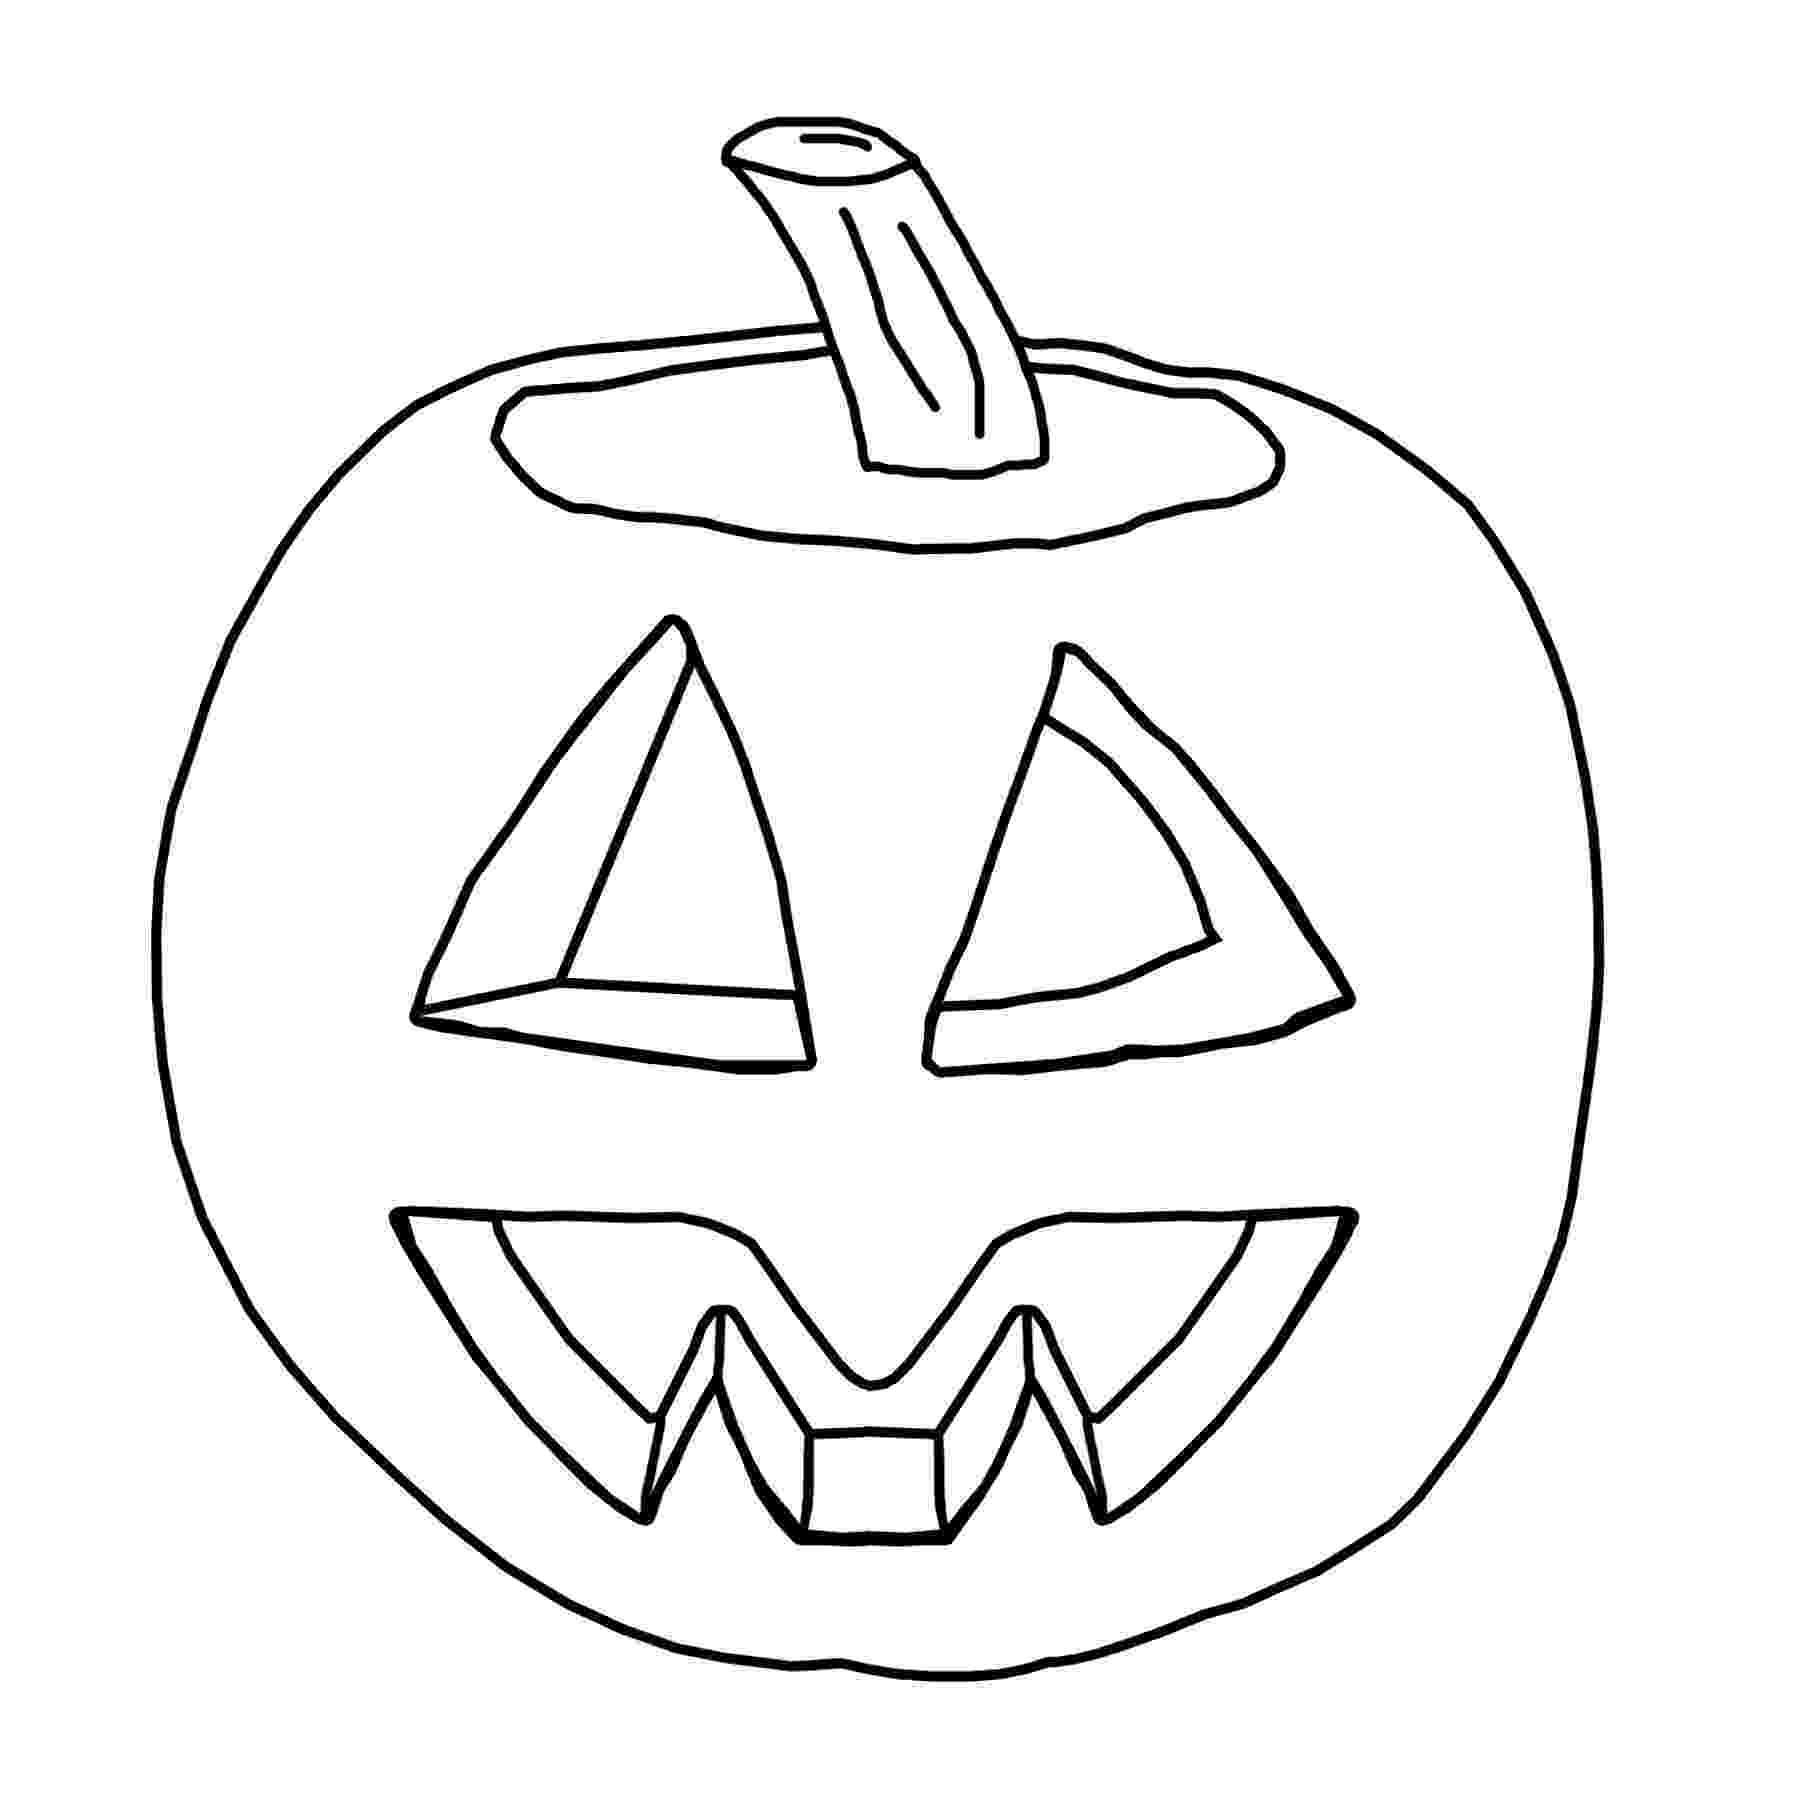 jack o lantern coloring page jack o lantern coloring page book for kids lantern page jack o coloring